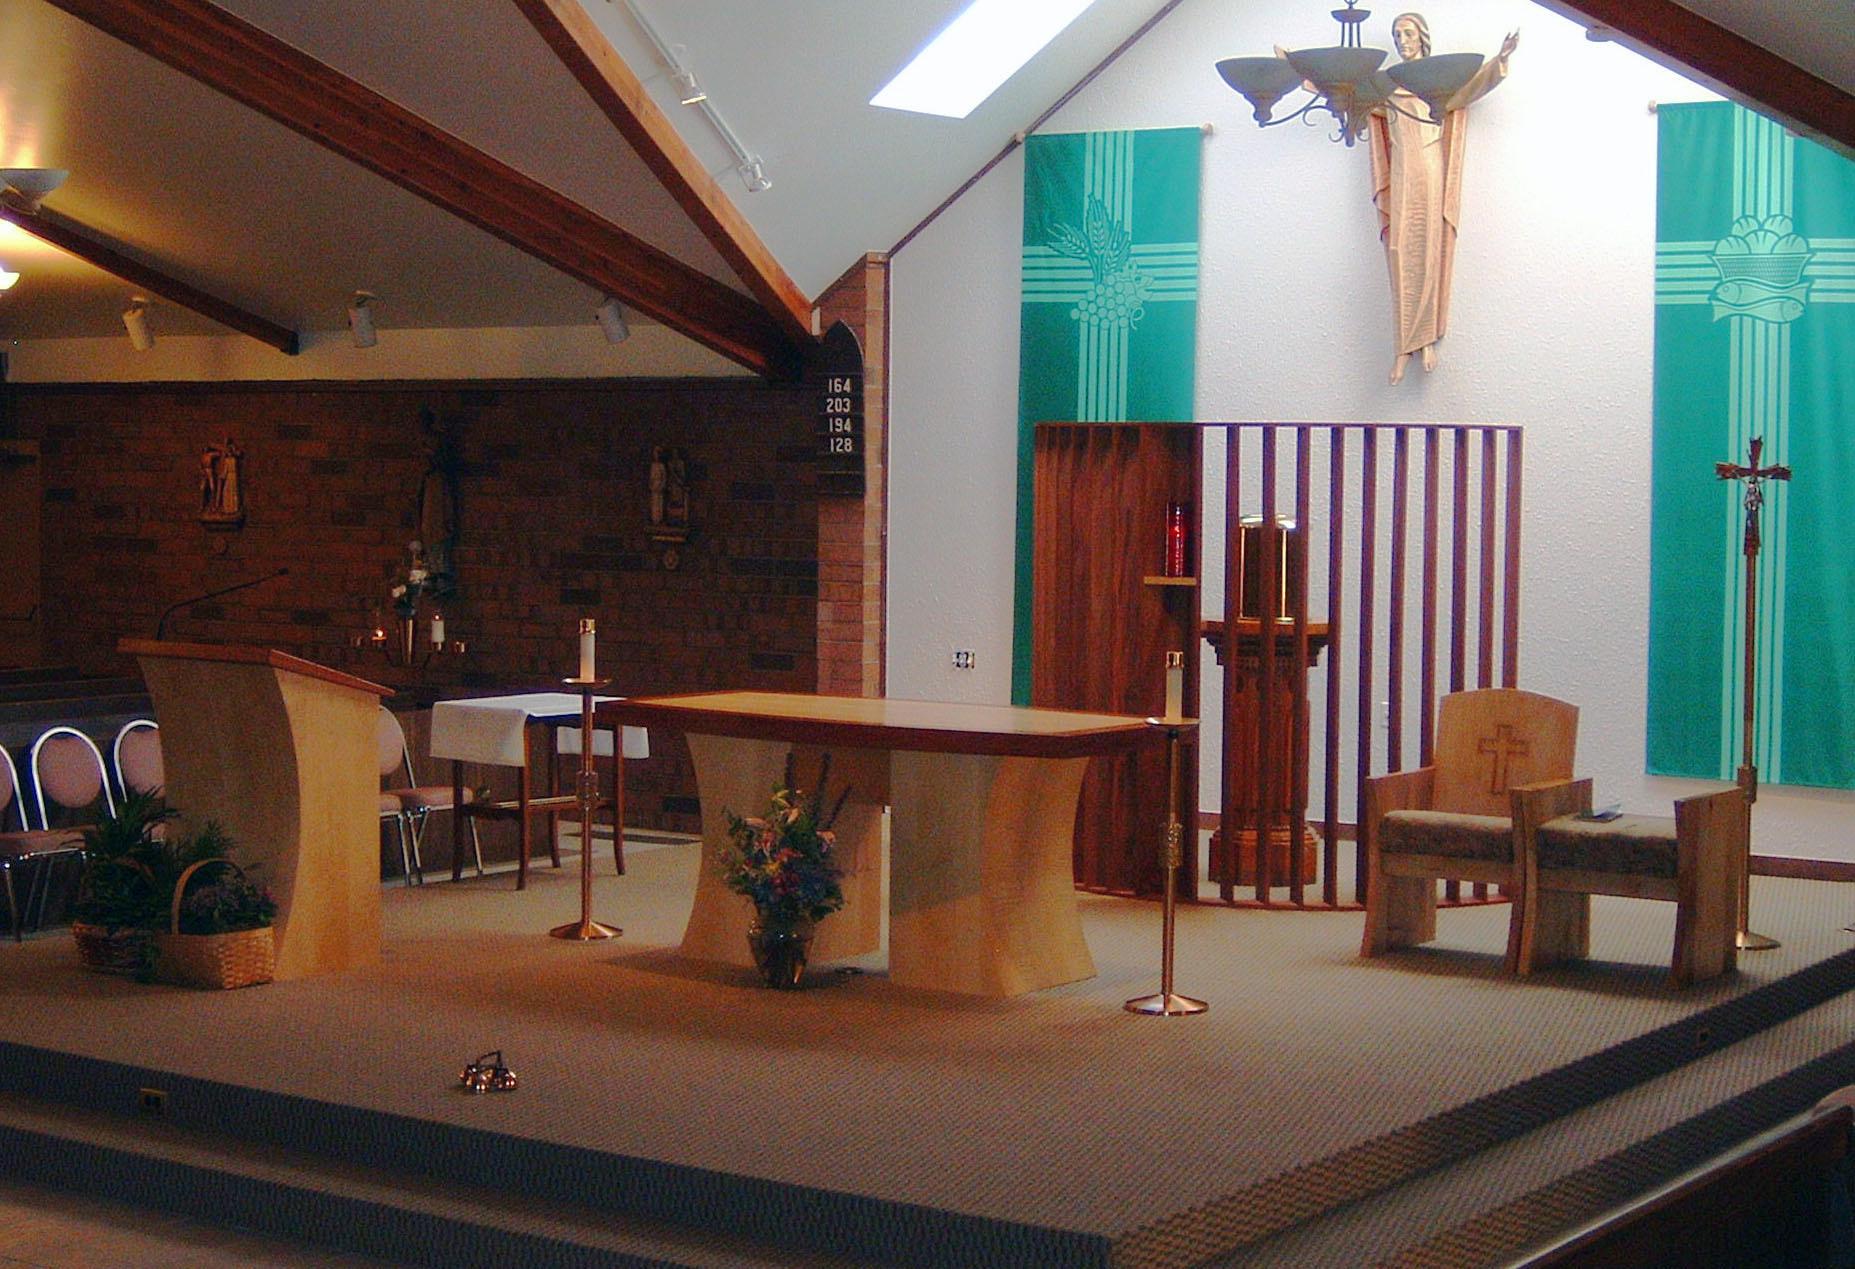 St. Therese Original Sanctuary